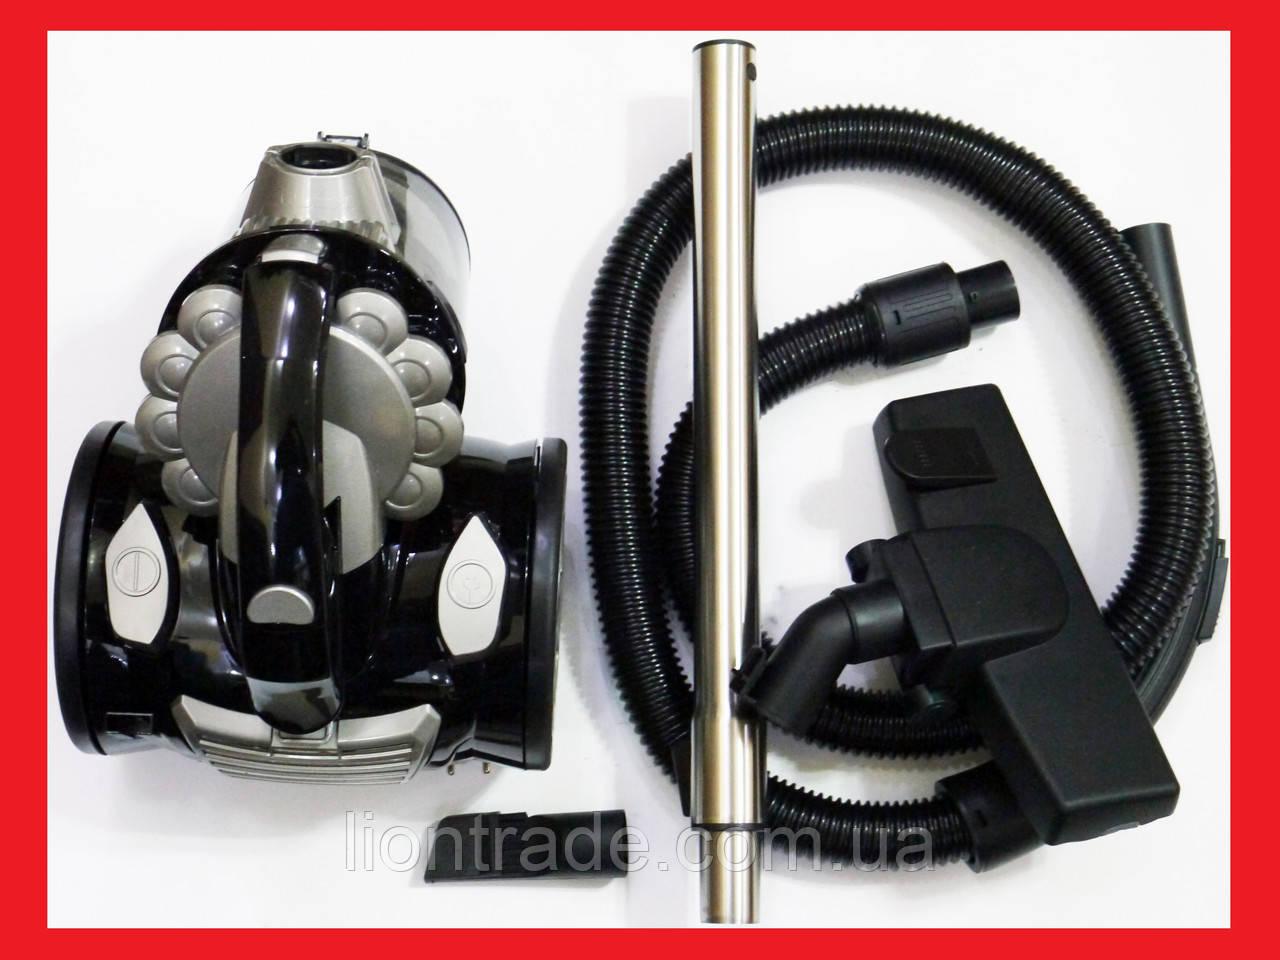 Пилосос AYA Aspirateur CJ005DN 700W 1,5 L